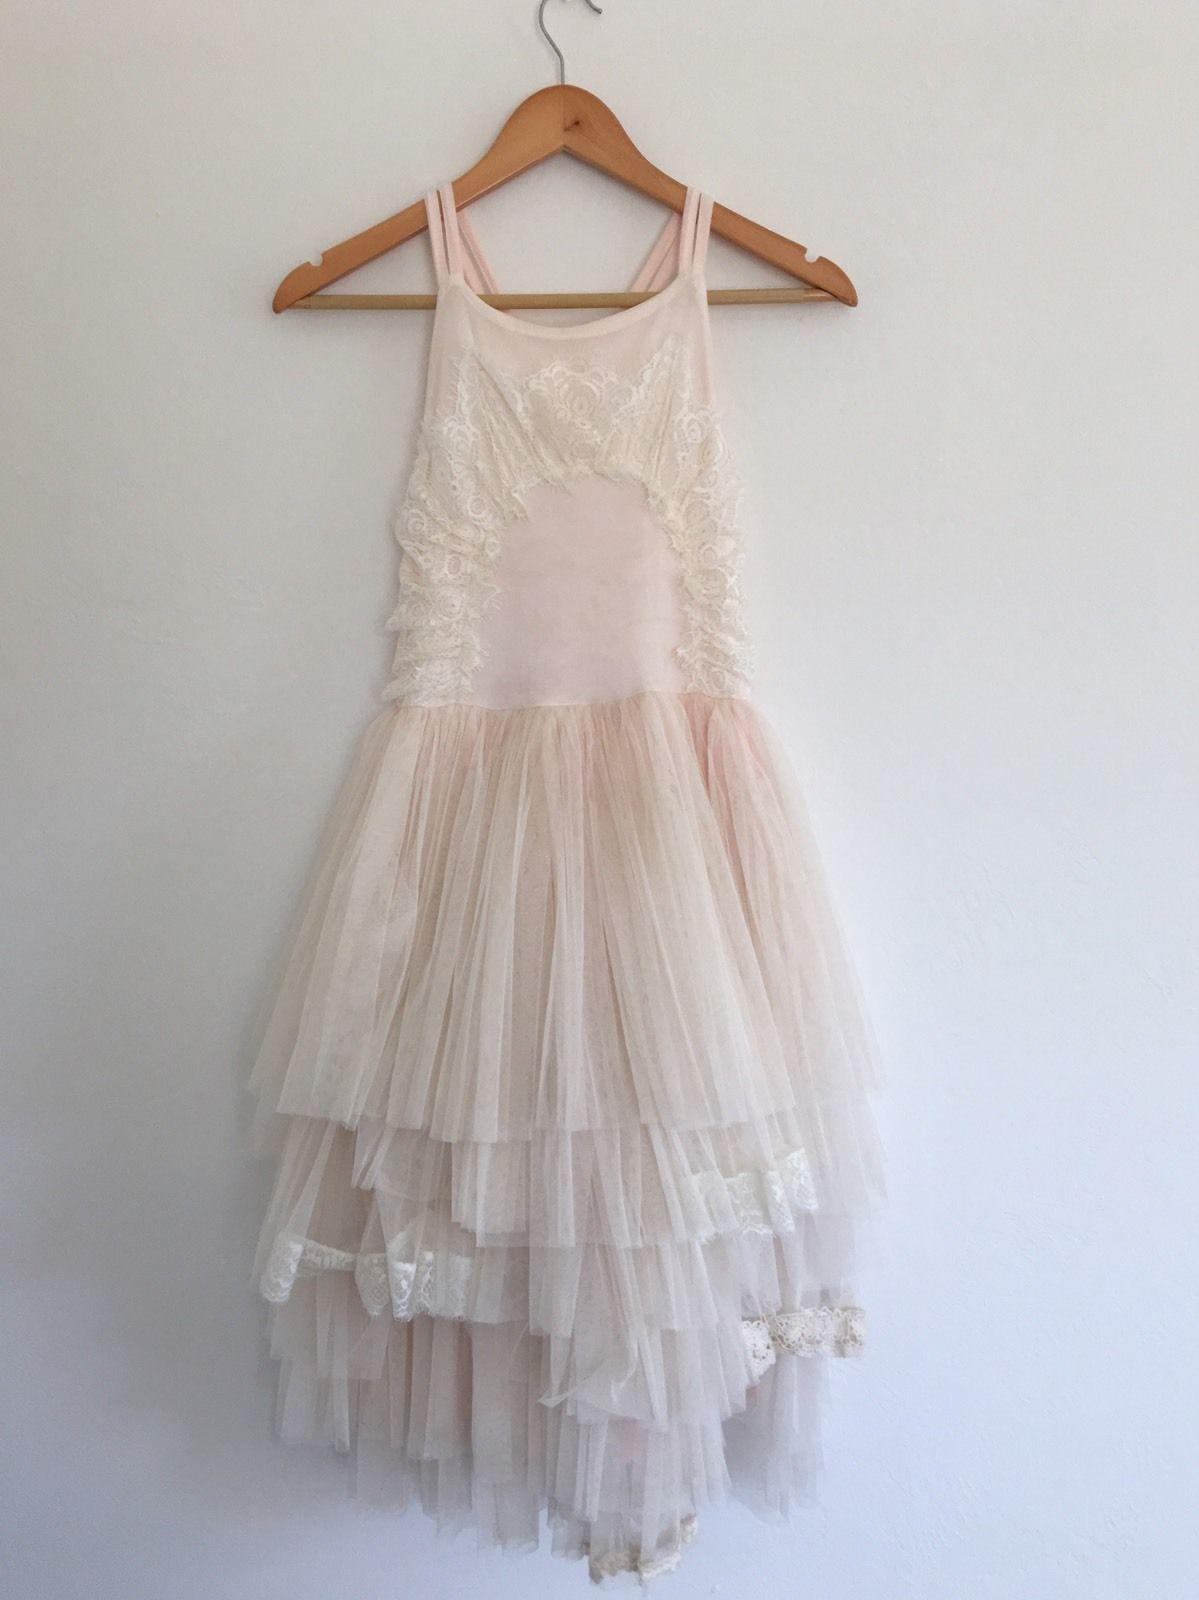 Dollcake Girls Flower Girl Dress Size 14 Blush Pink Lace Dress Up Crochet